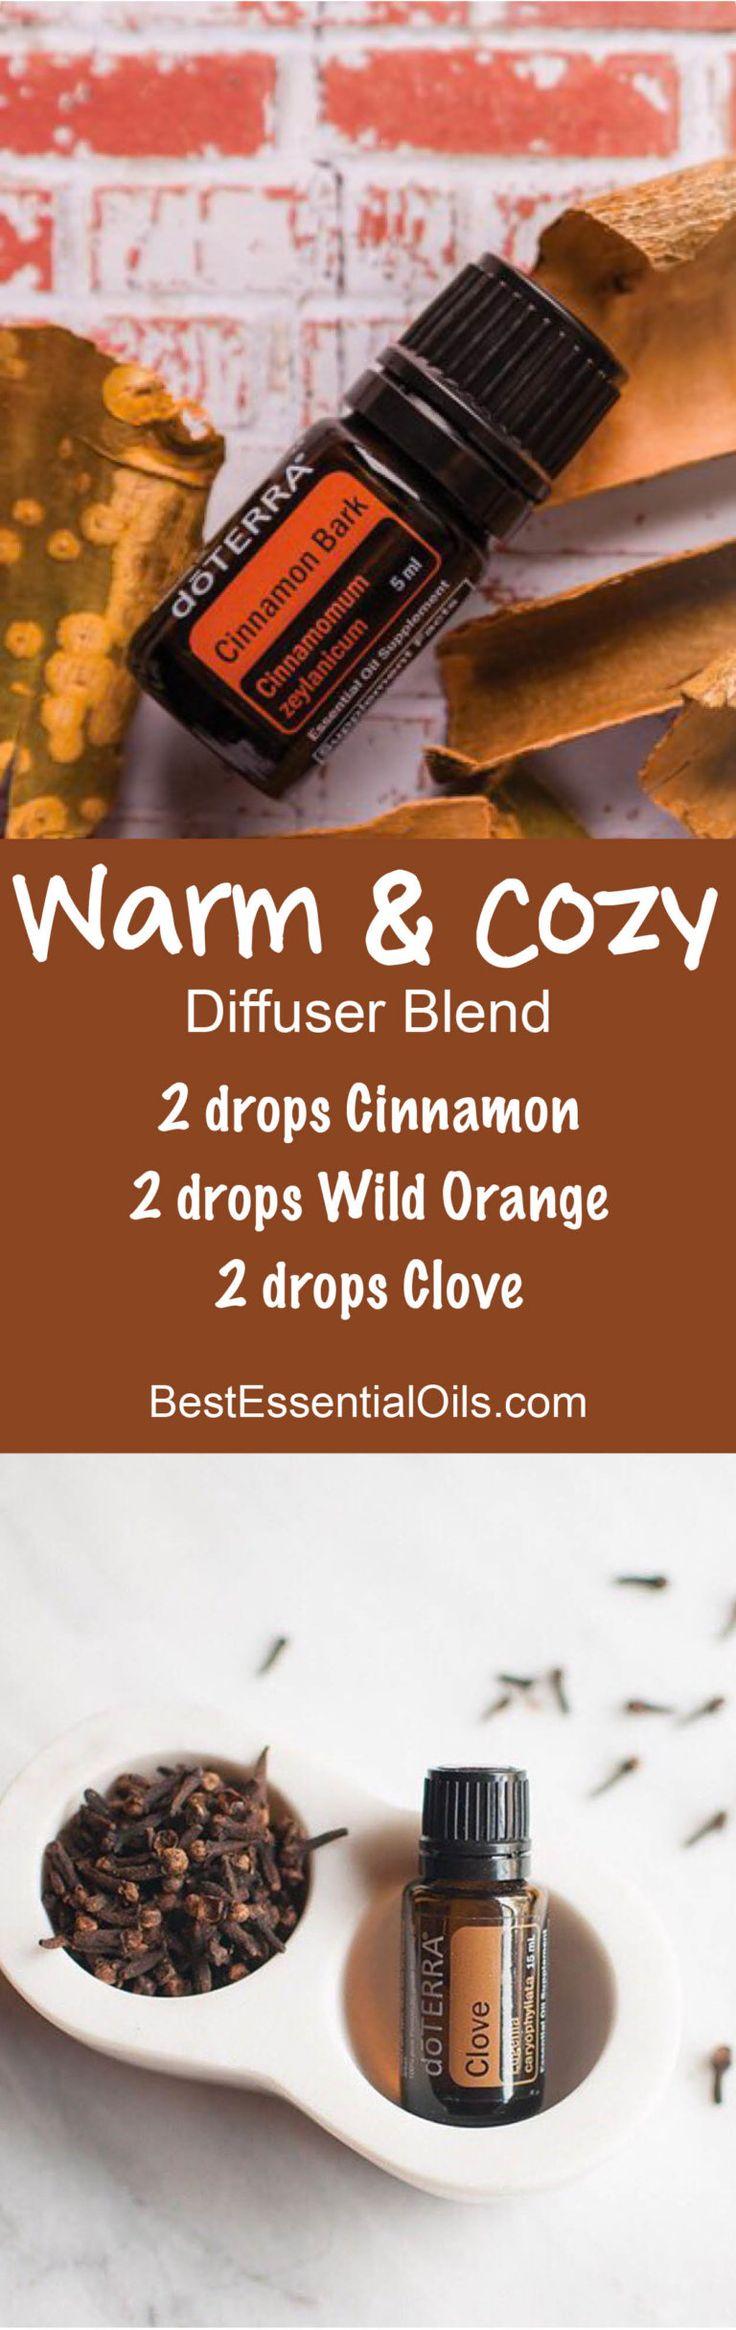 Warm & Cozy Essential Oils Diffuser Blend ••• Buy dōTERRA essential oils online at www.mydoterra.com/suzysholar, or contact me suzy.sholar@gmail.com for more info.